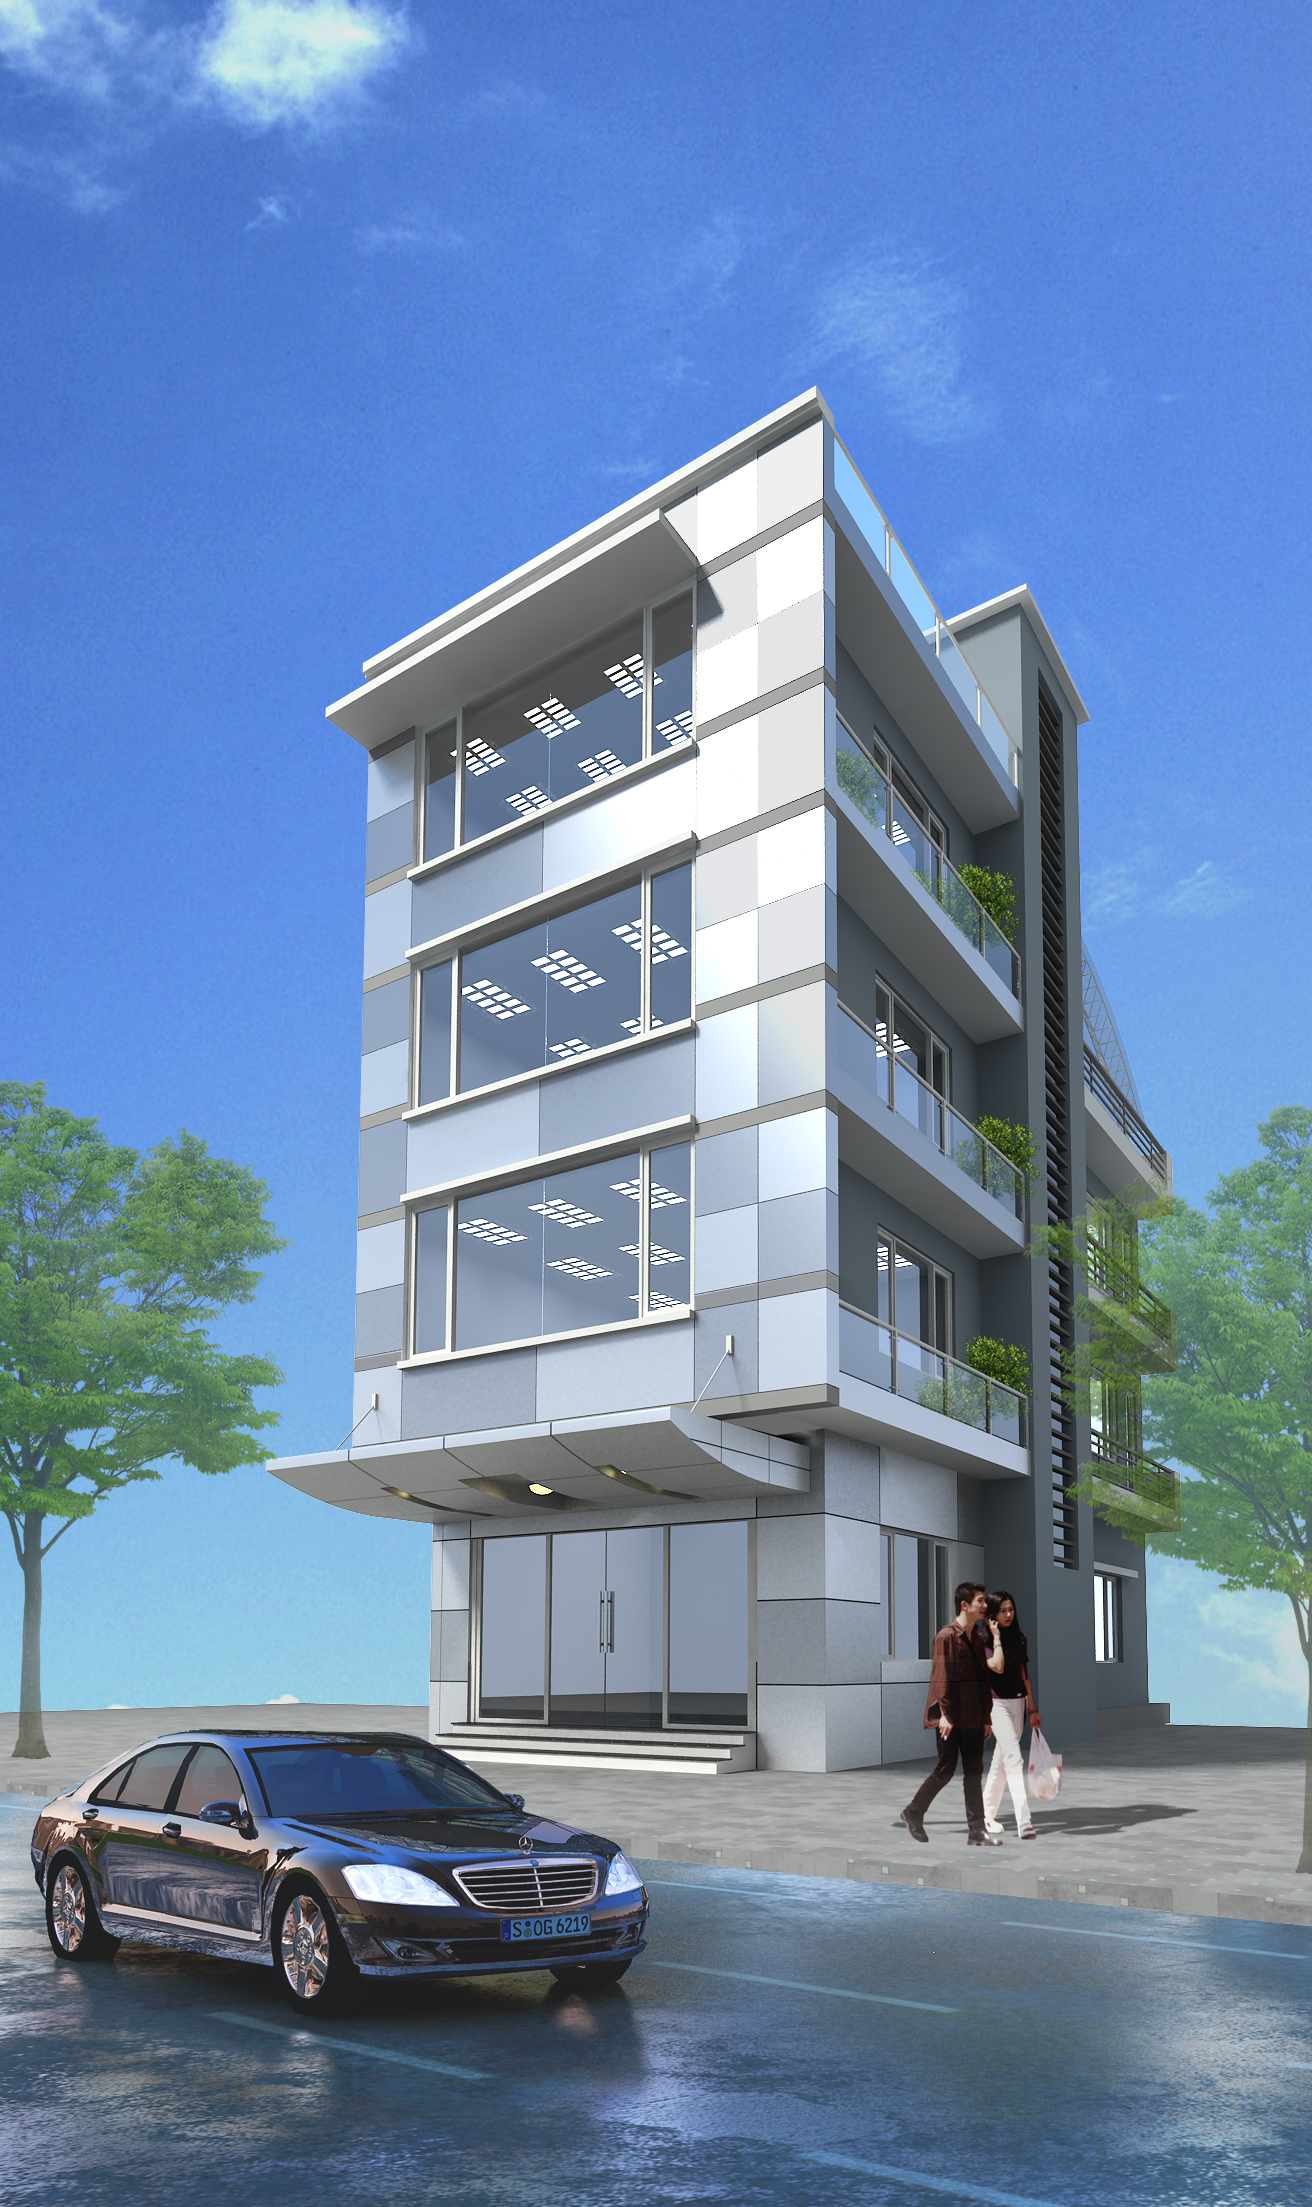 3d models small office building free 3d model max obj for Small office building design plans